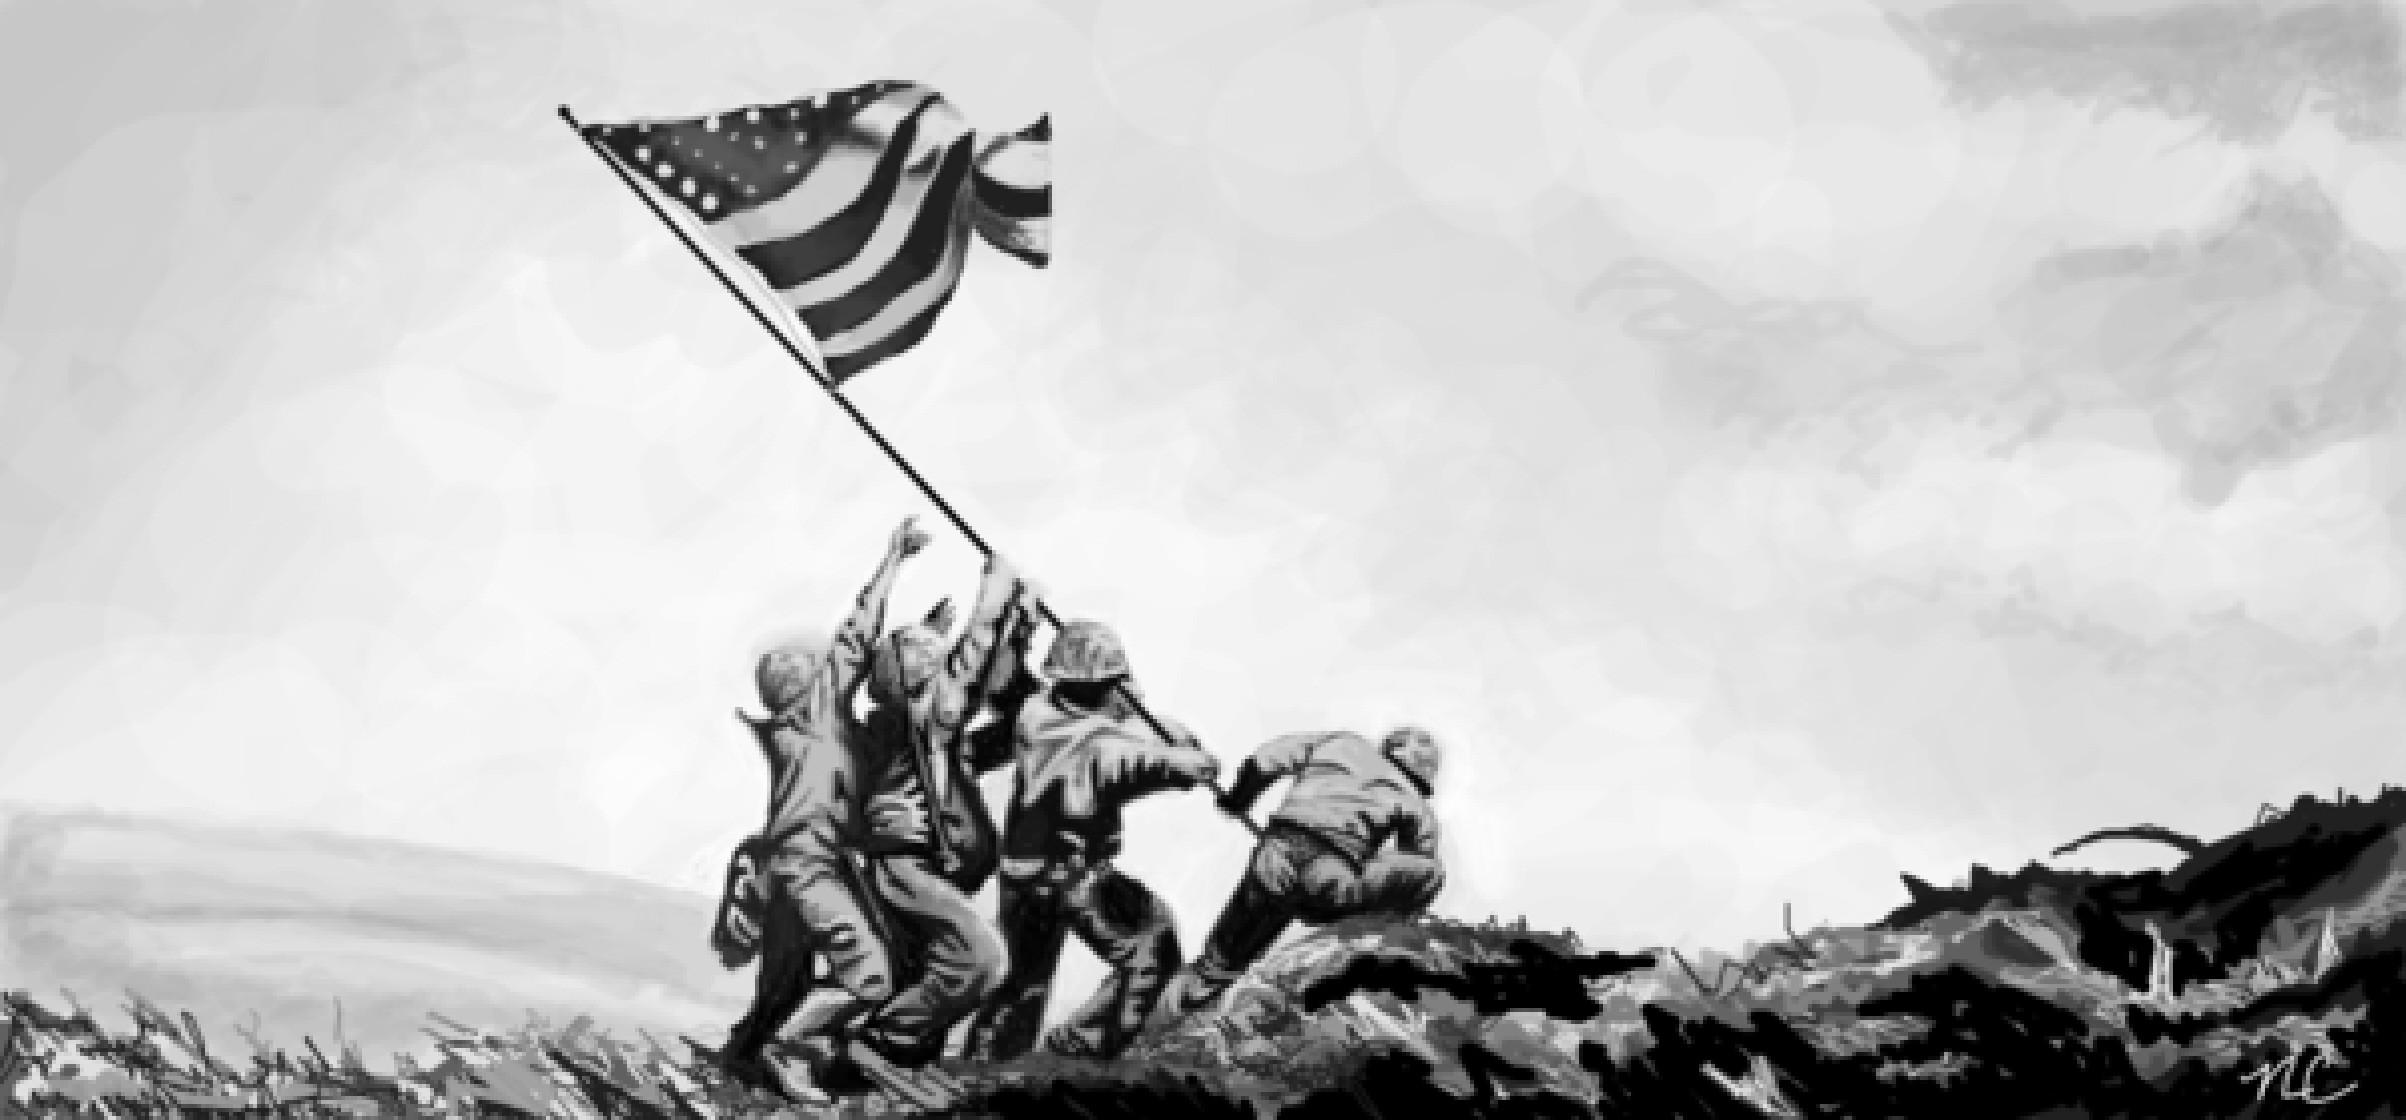 Iwo Jima Flag Raising Wallpaper